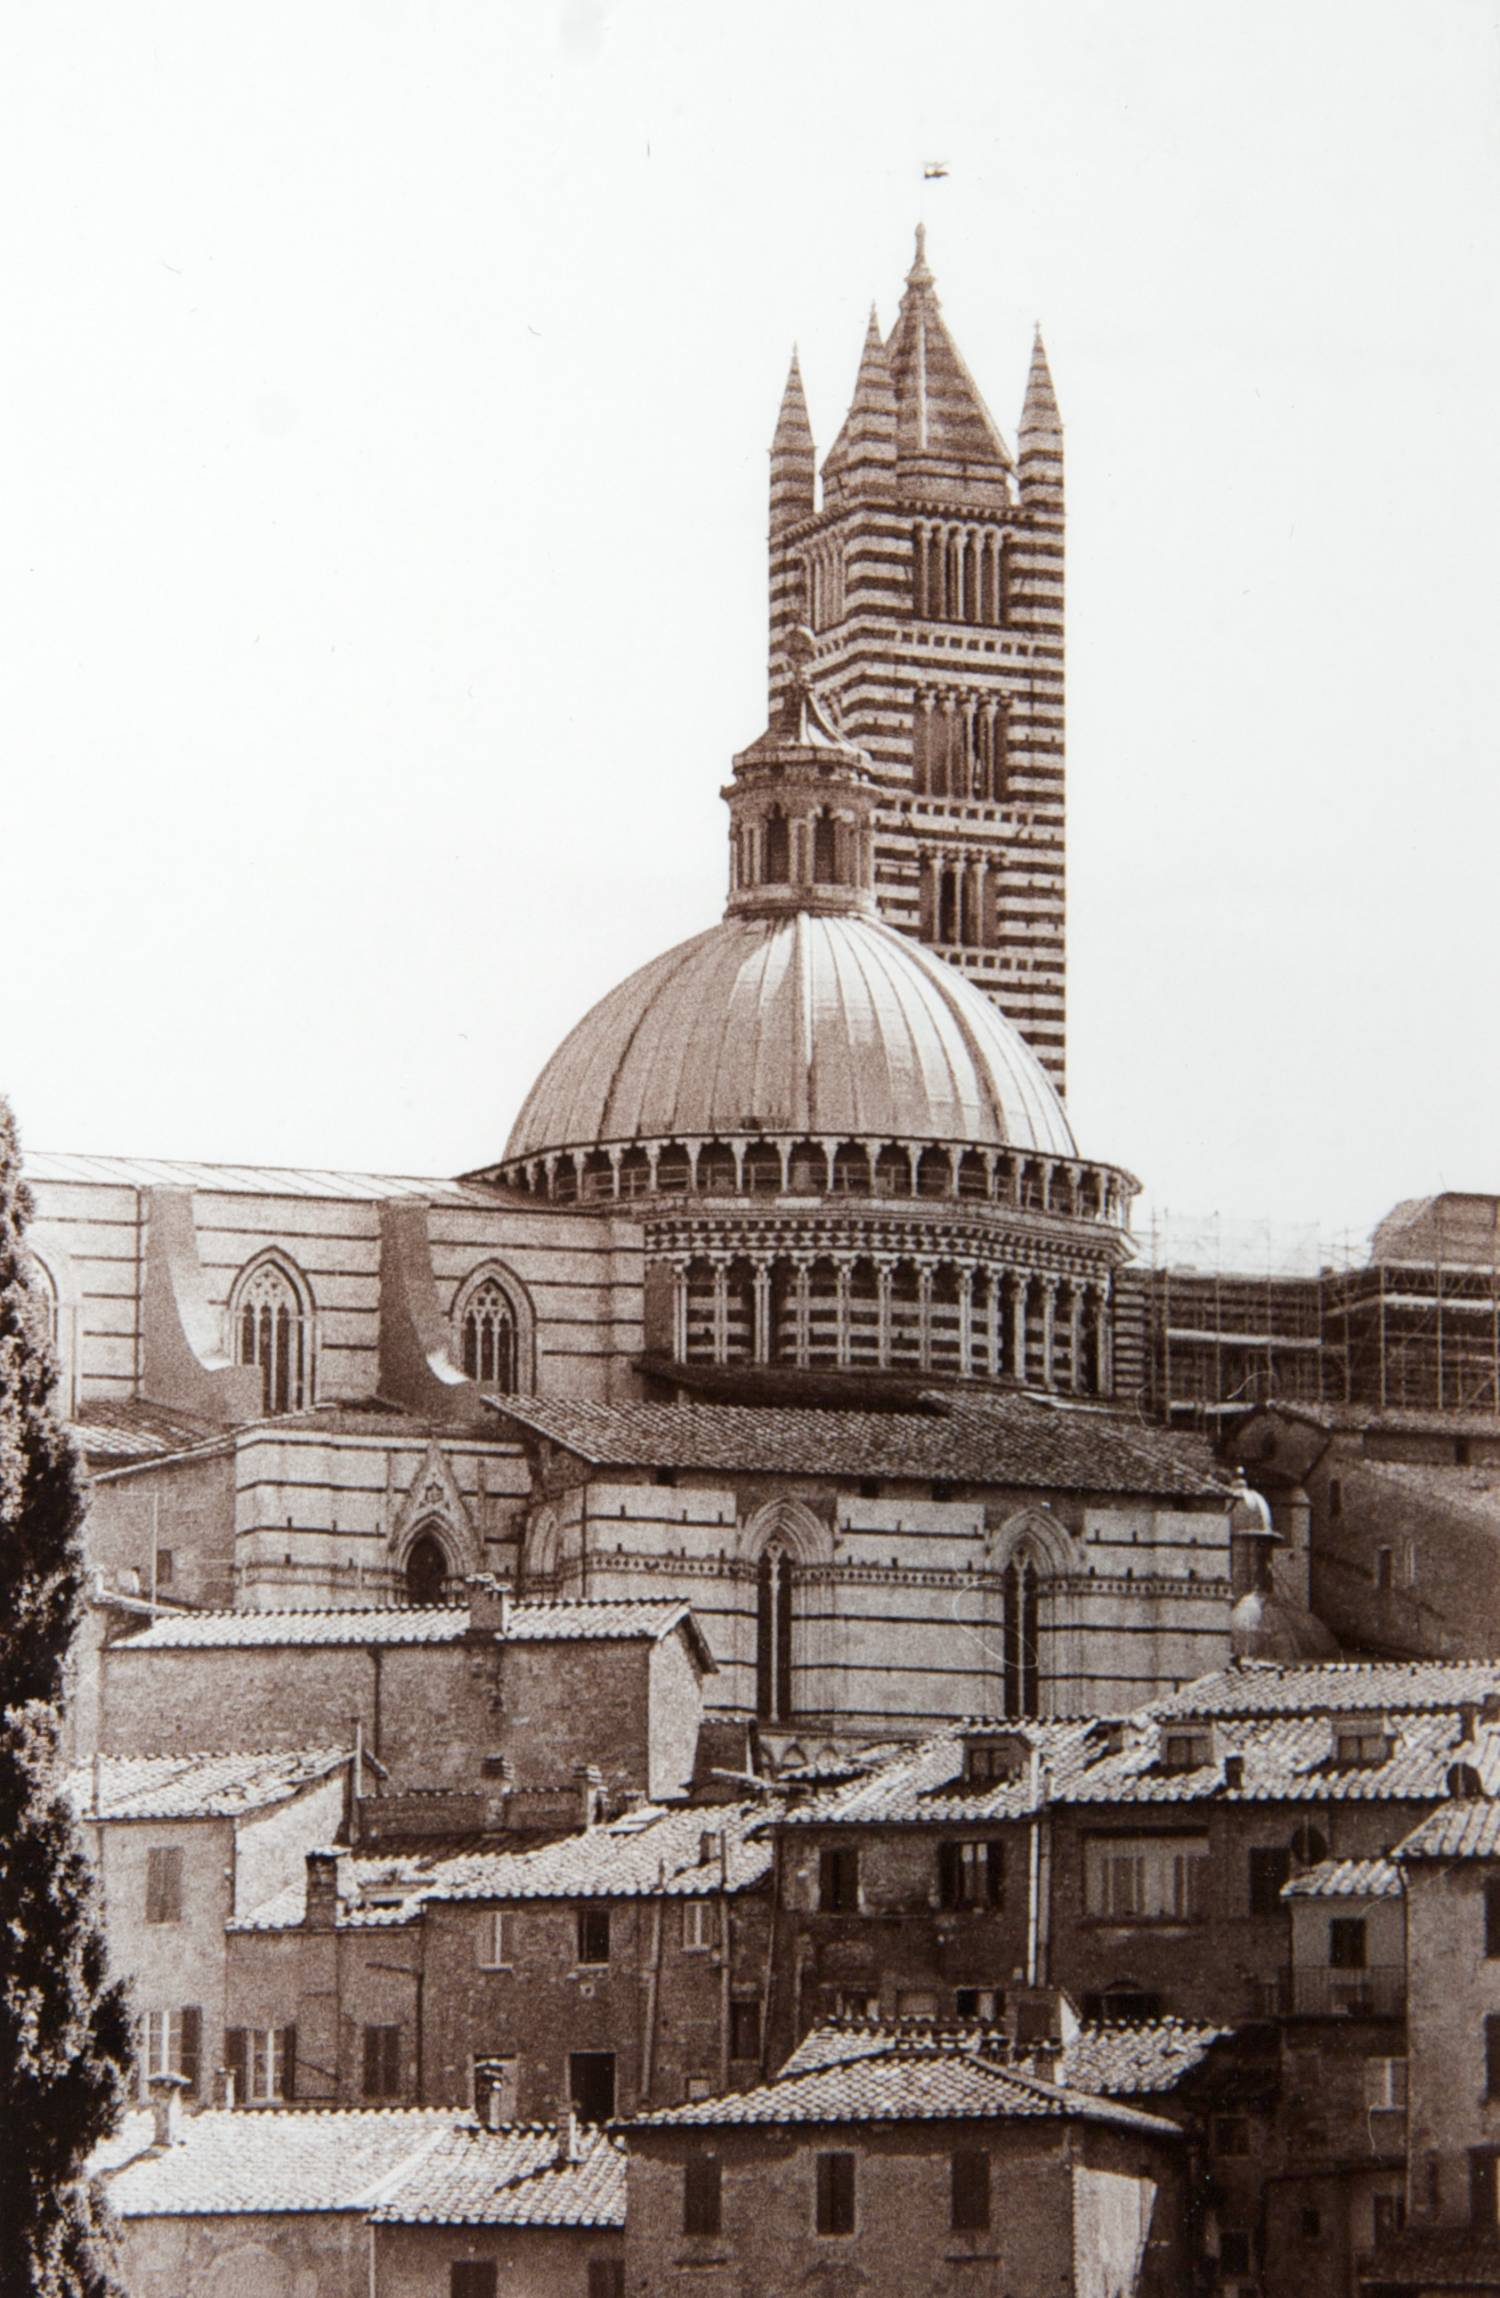 Siena Vista (Italy)